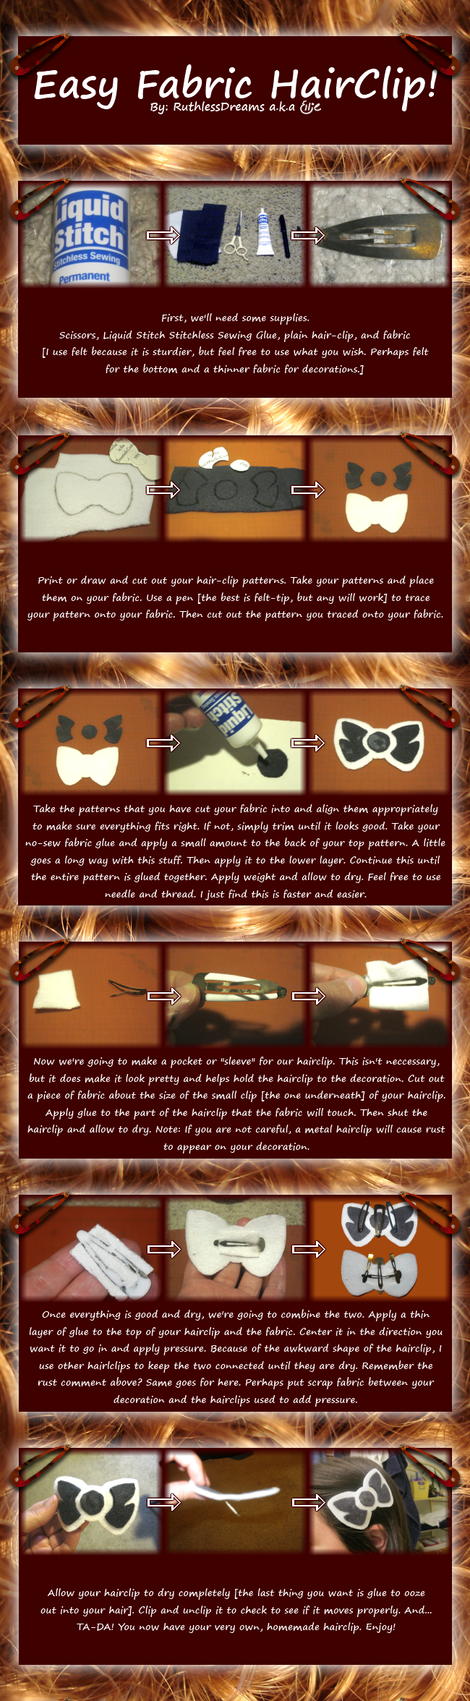 Easy Fabric Hair Clip Tutorial by RuthlessDreams